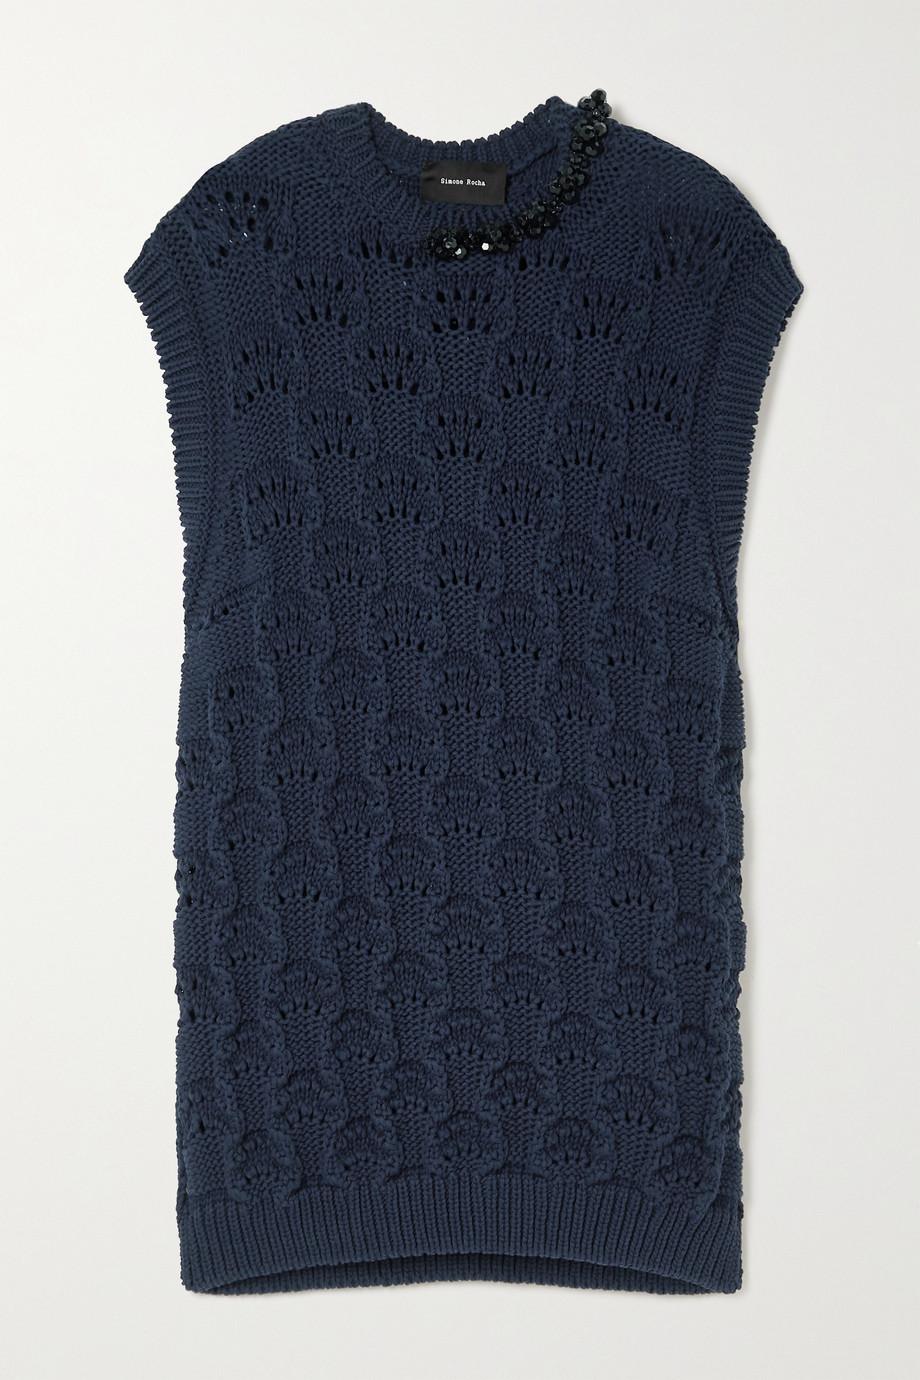 Simone Rocha Oversized bead-embellished pointelle-knit organic cotton tank